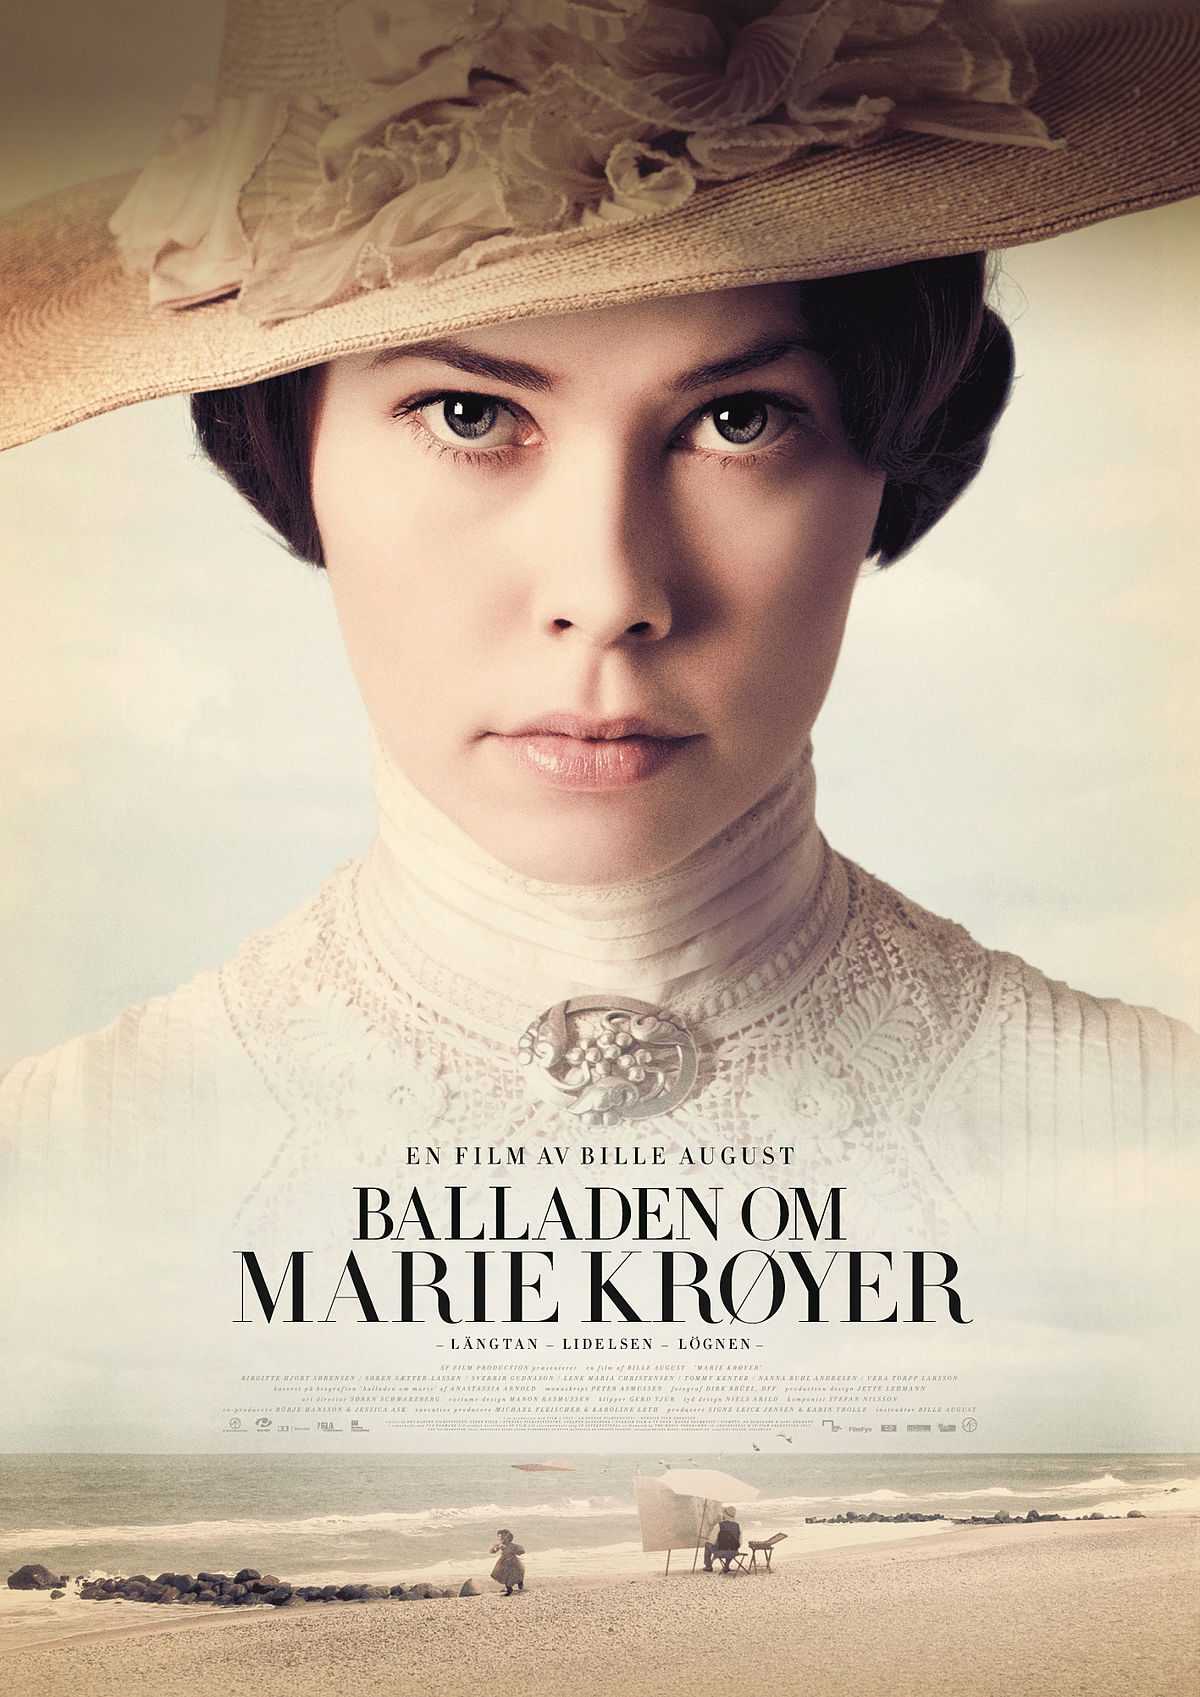 http://upload.wikimedia.org/wikipedia/commons/thumb/2/29/Marie_Kr%C3%B8yer_movie_poster.jpg/1200px-Marie_Kr%C3%B8yer_movie_poster.jpg